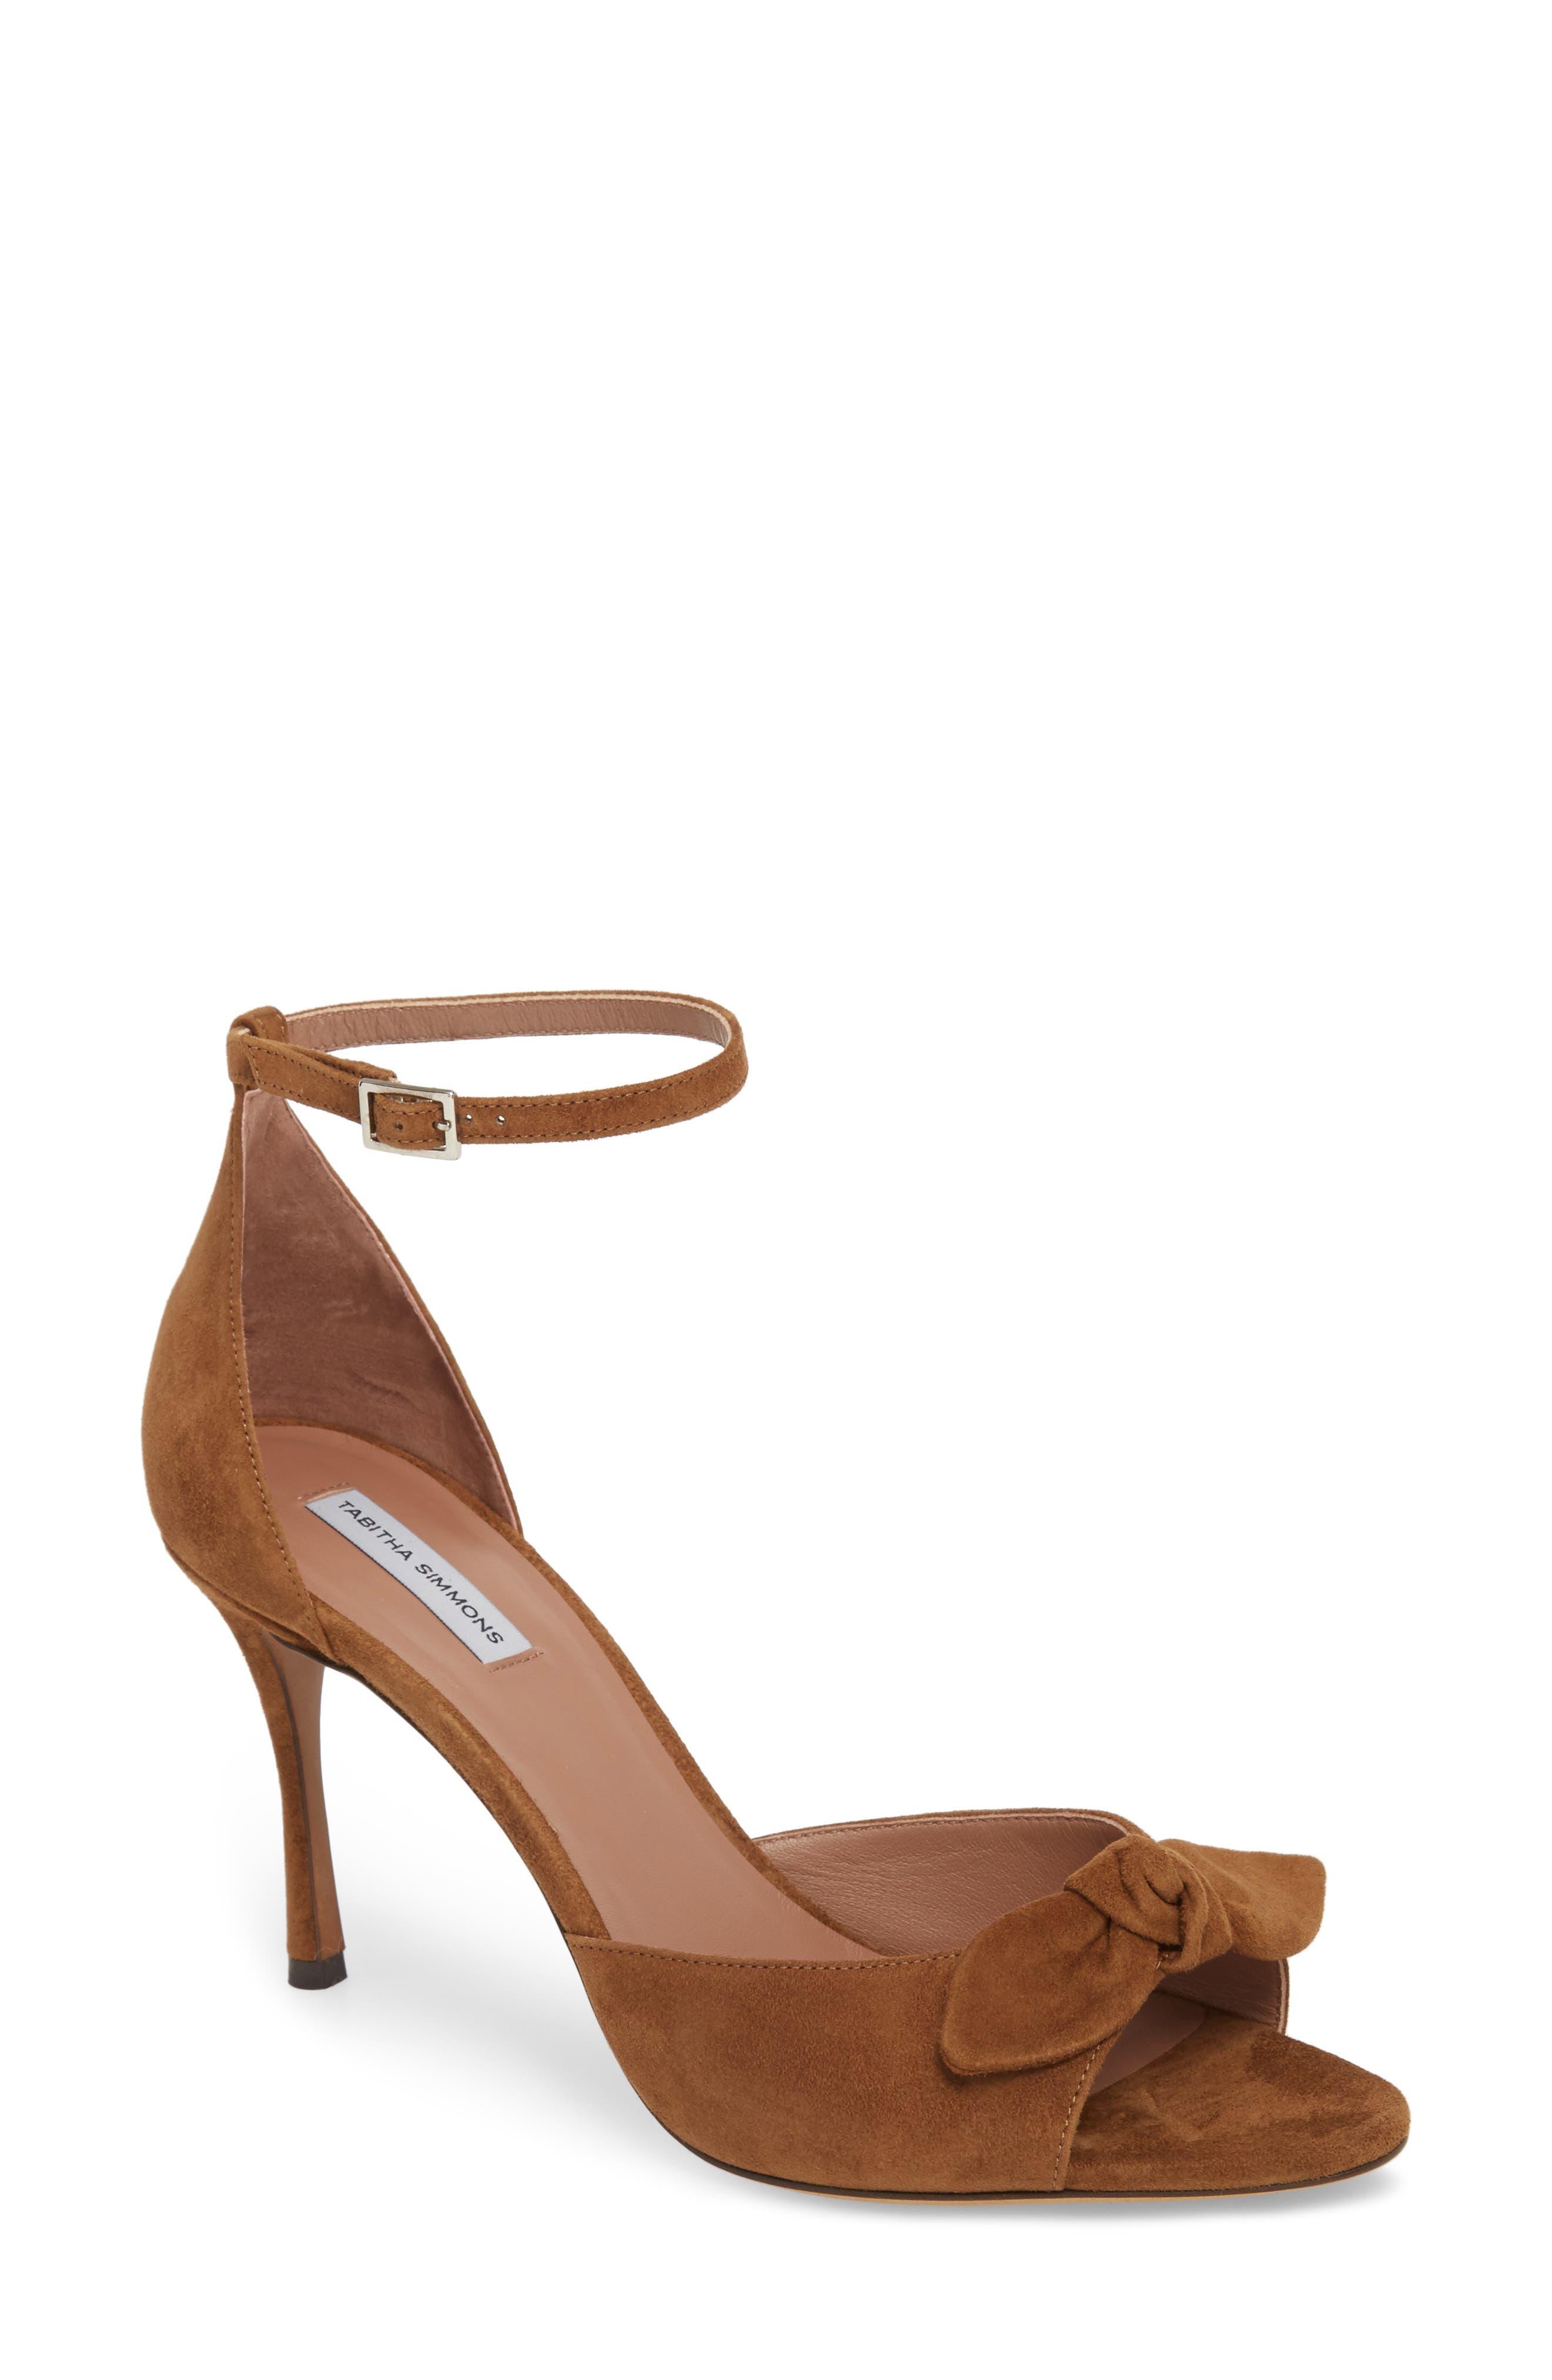 Tabitha Simmons Mimmi Bow Ankle Strap Sandal (Women)